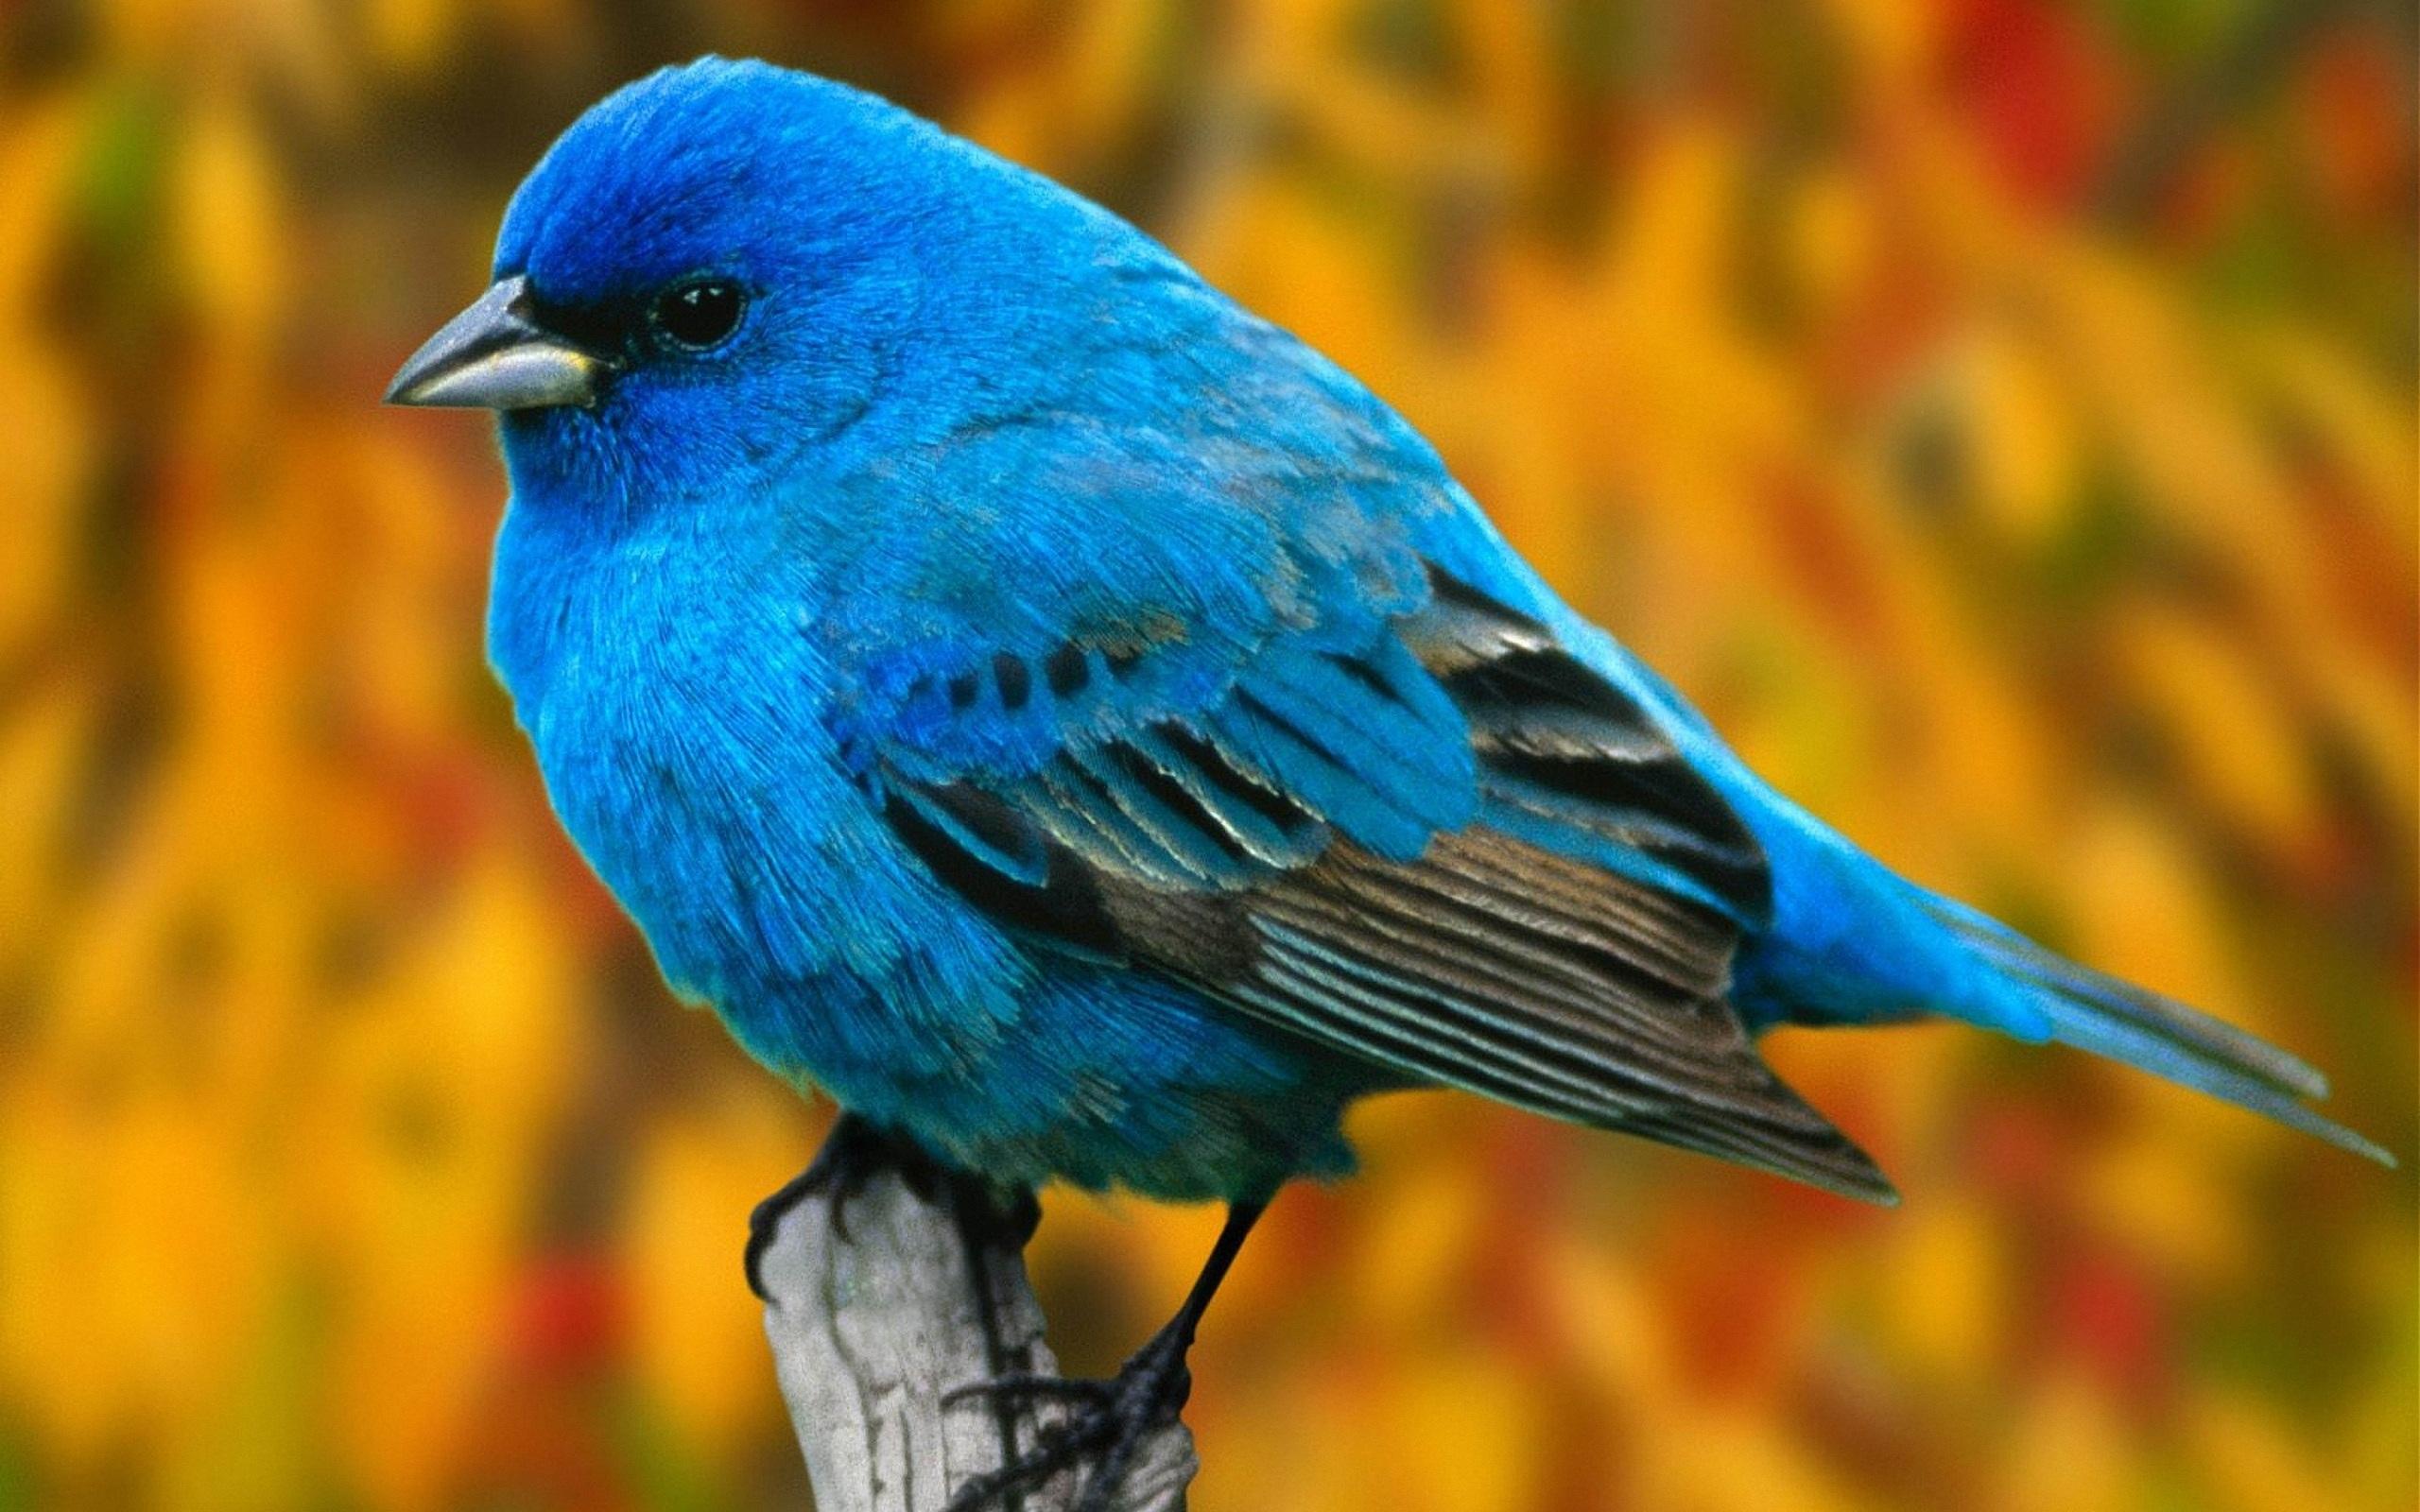 بالصور صور طيور , مجموعه صور طيور زينه رائعه 2404 8